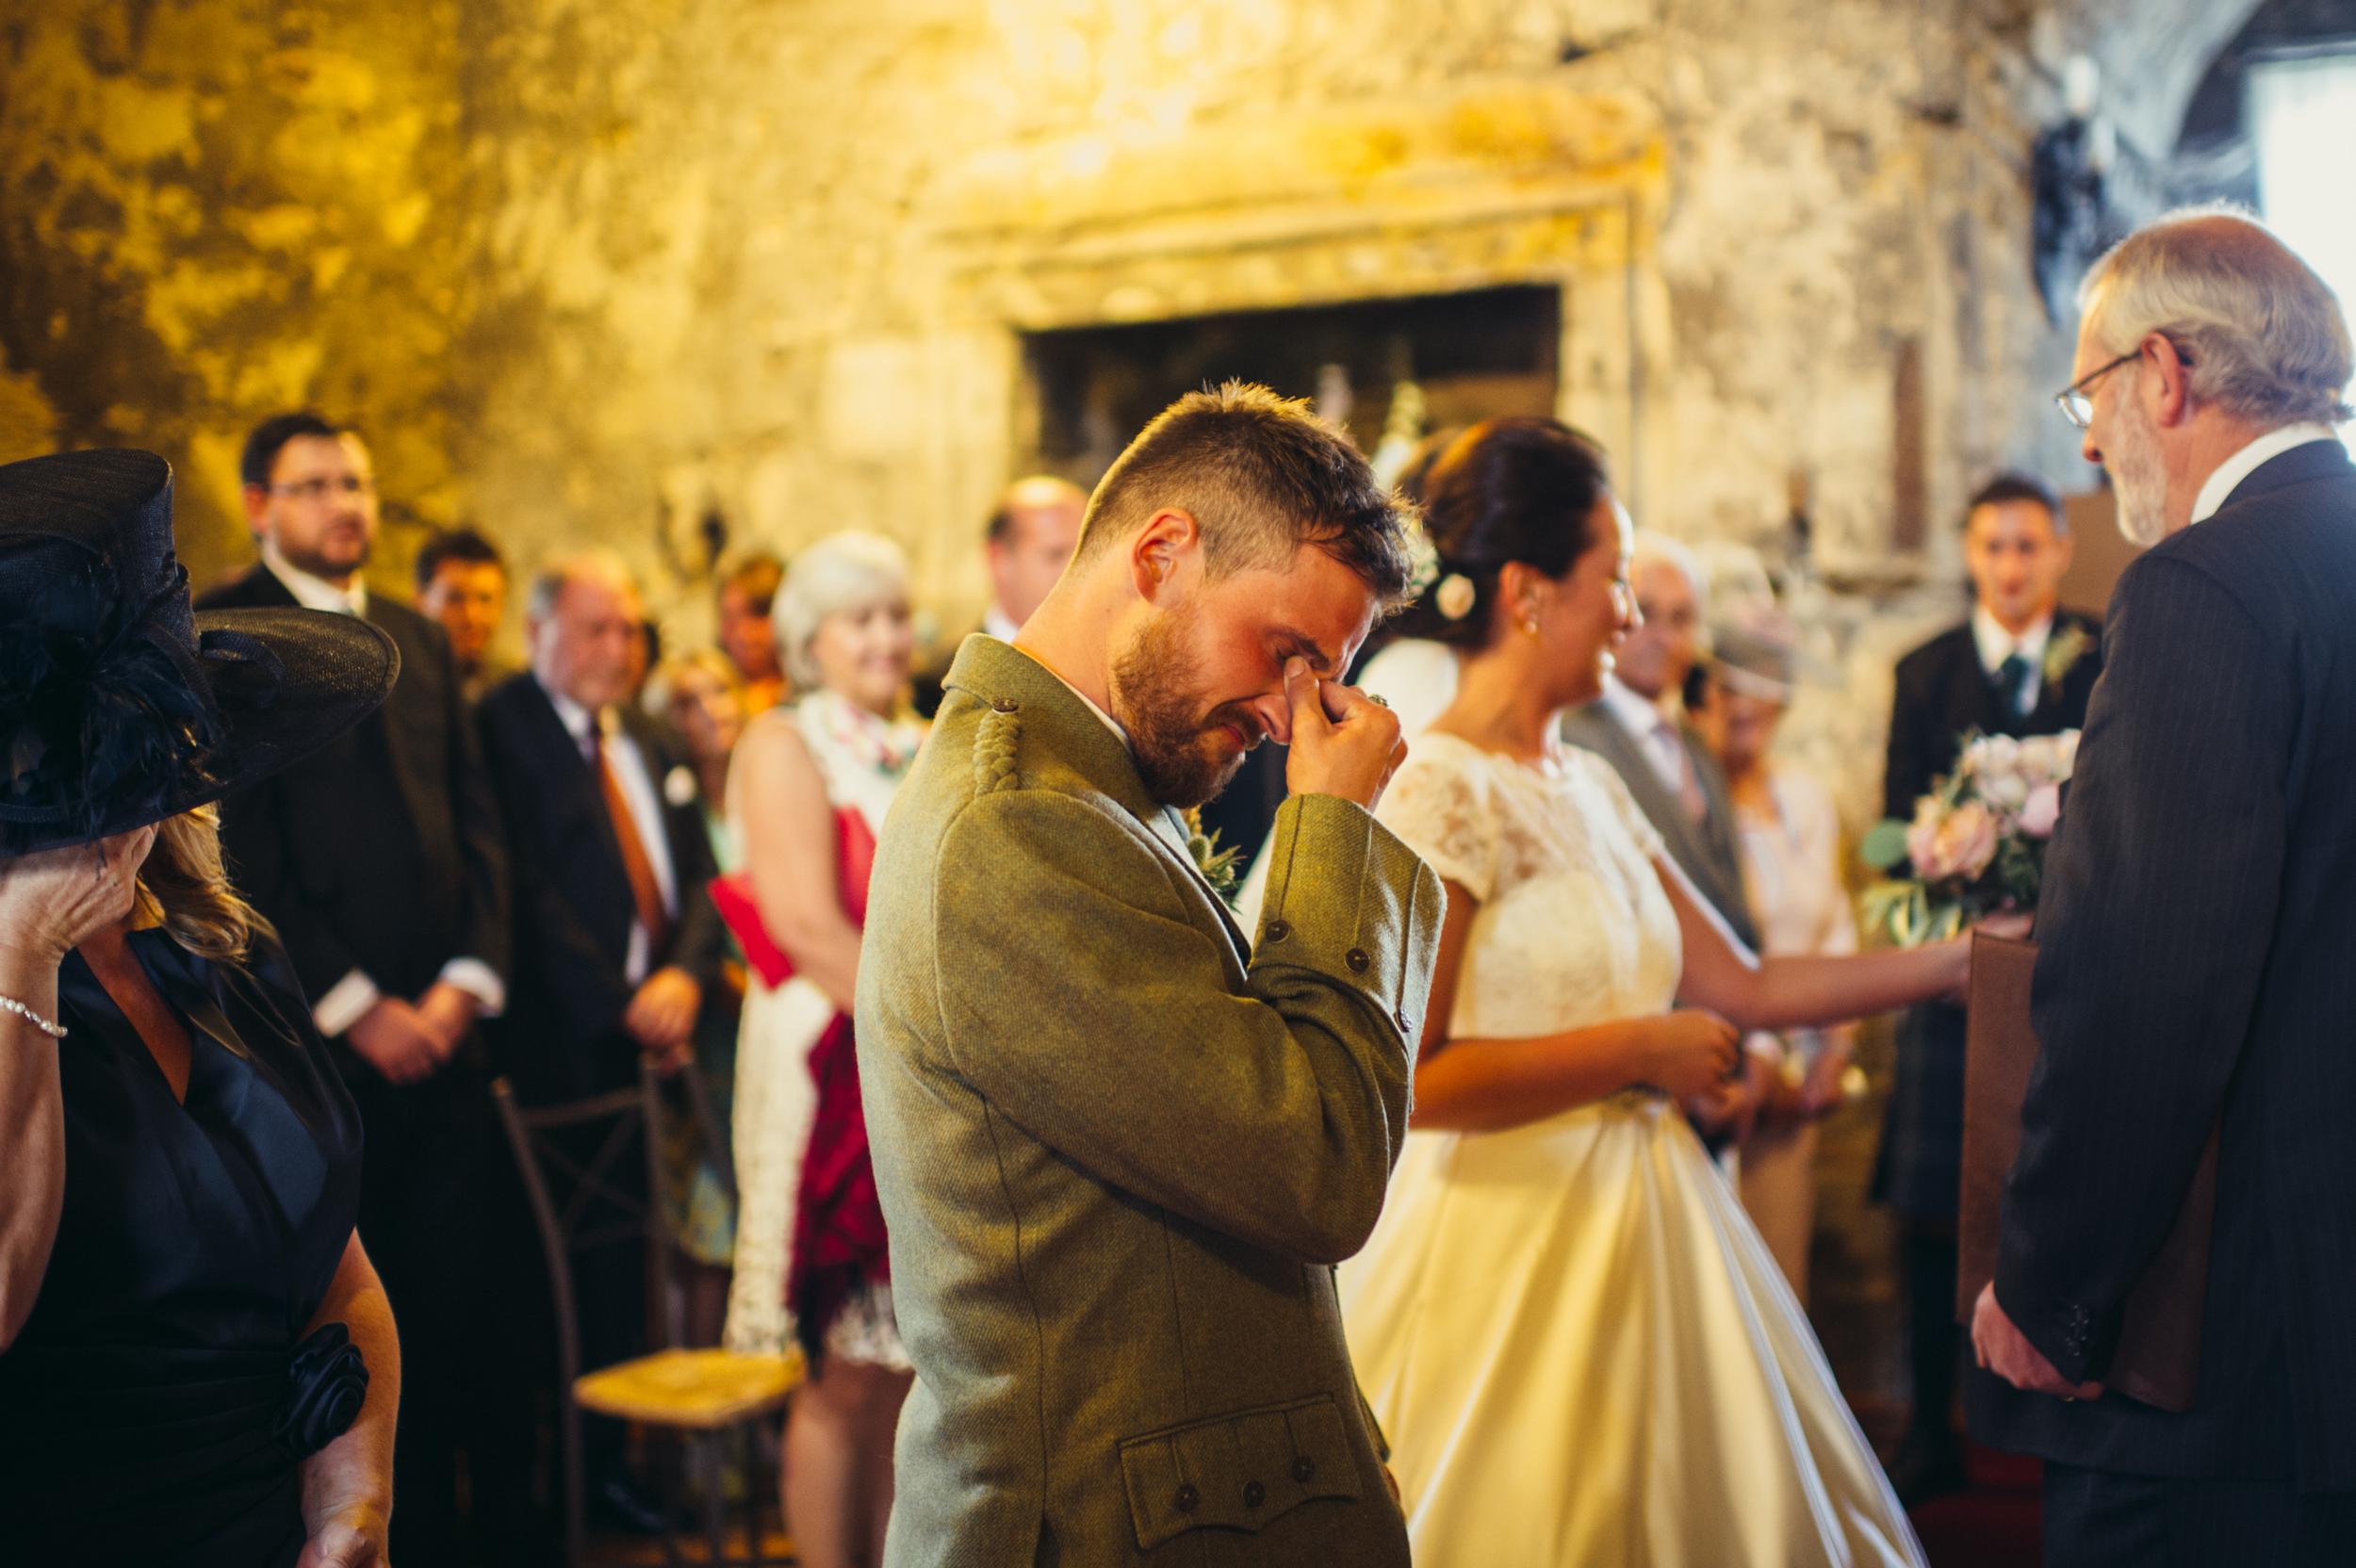 0099-lisa-devine-alternative-creative-wedding-photography-glasgow-edinburgh.JPG